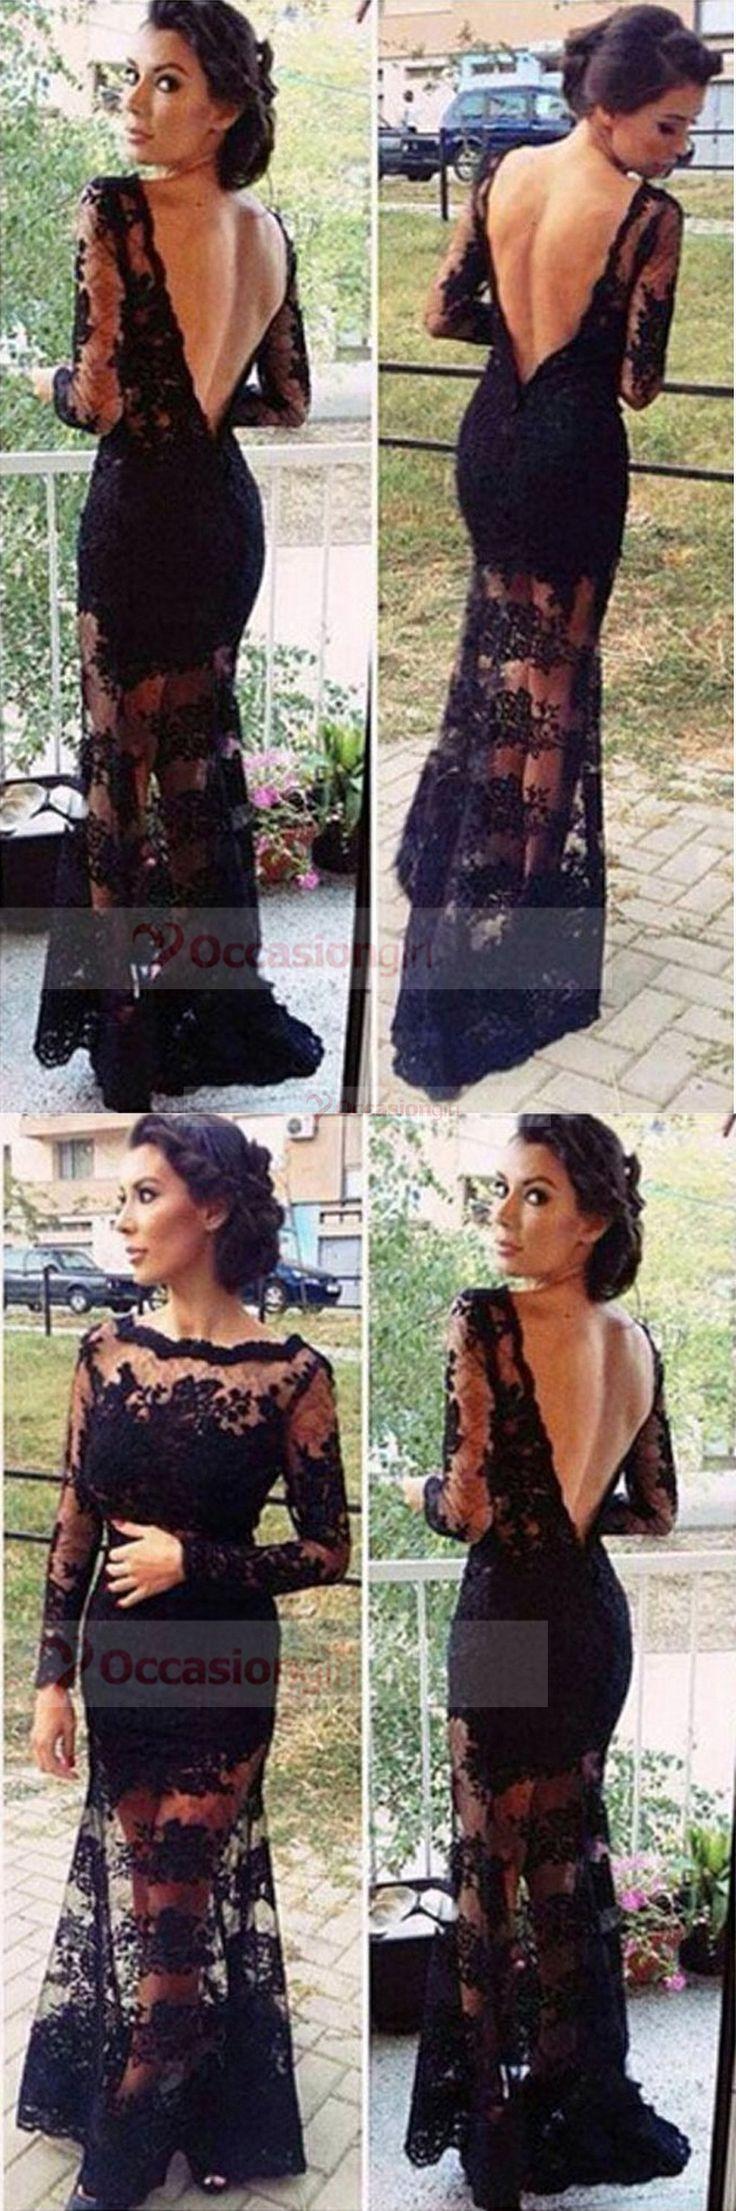 black prom dress, long prom dress, 2016 prom dress, lace prom dress, sexy party dress, evening dress